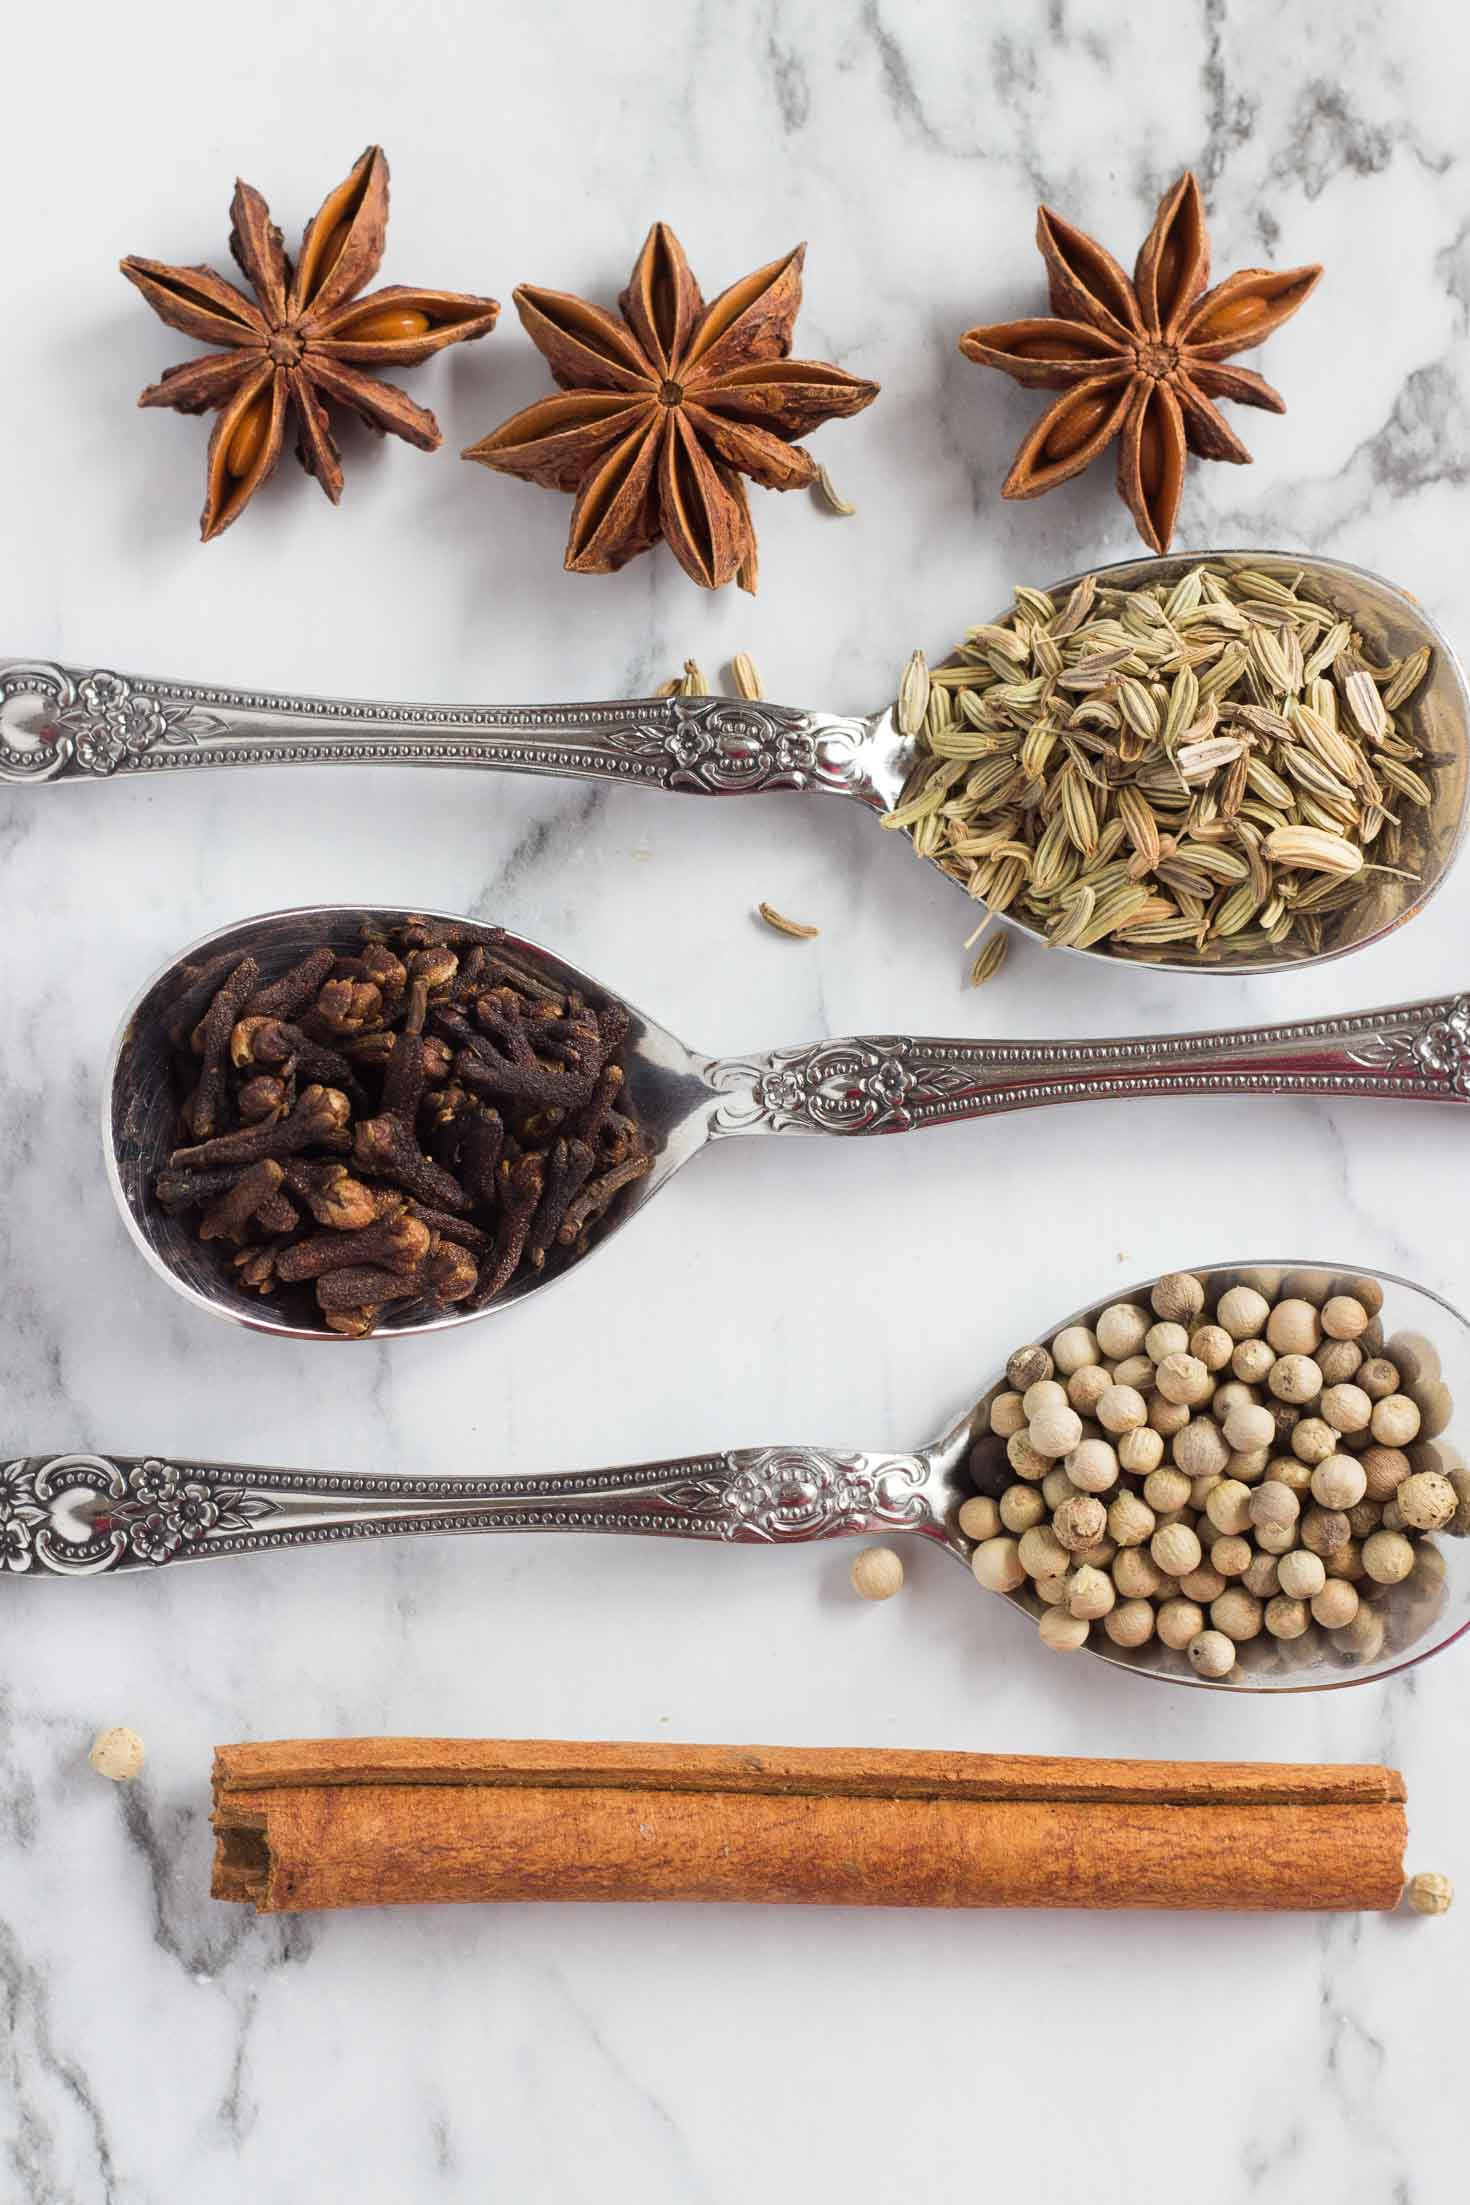 Chinese 5-Spice Powder Ingredients